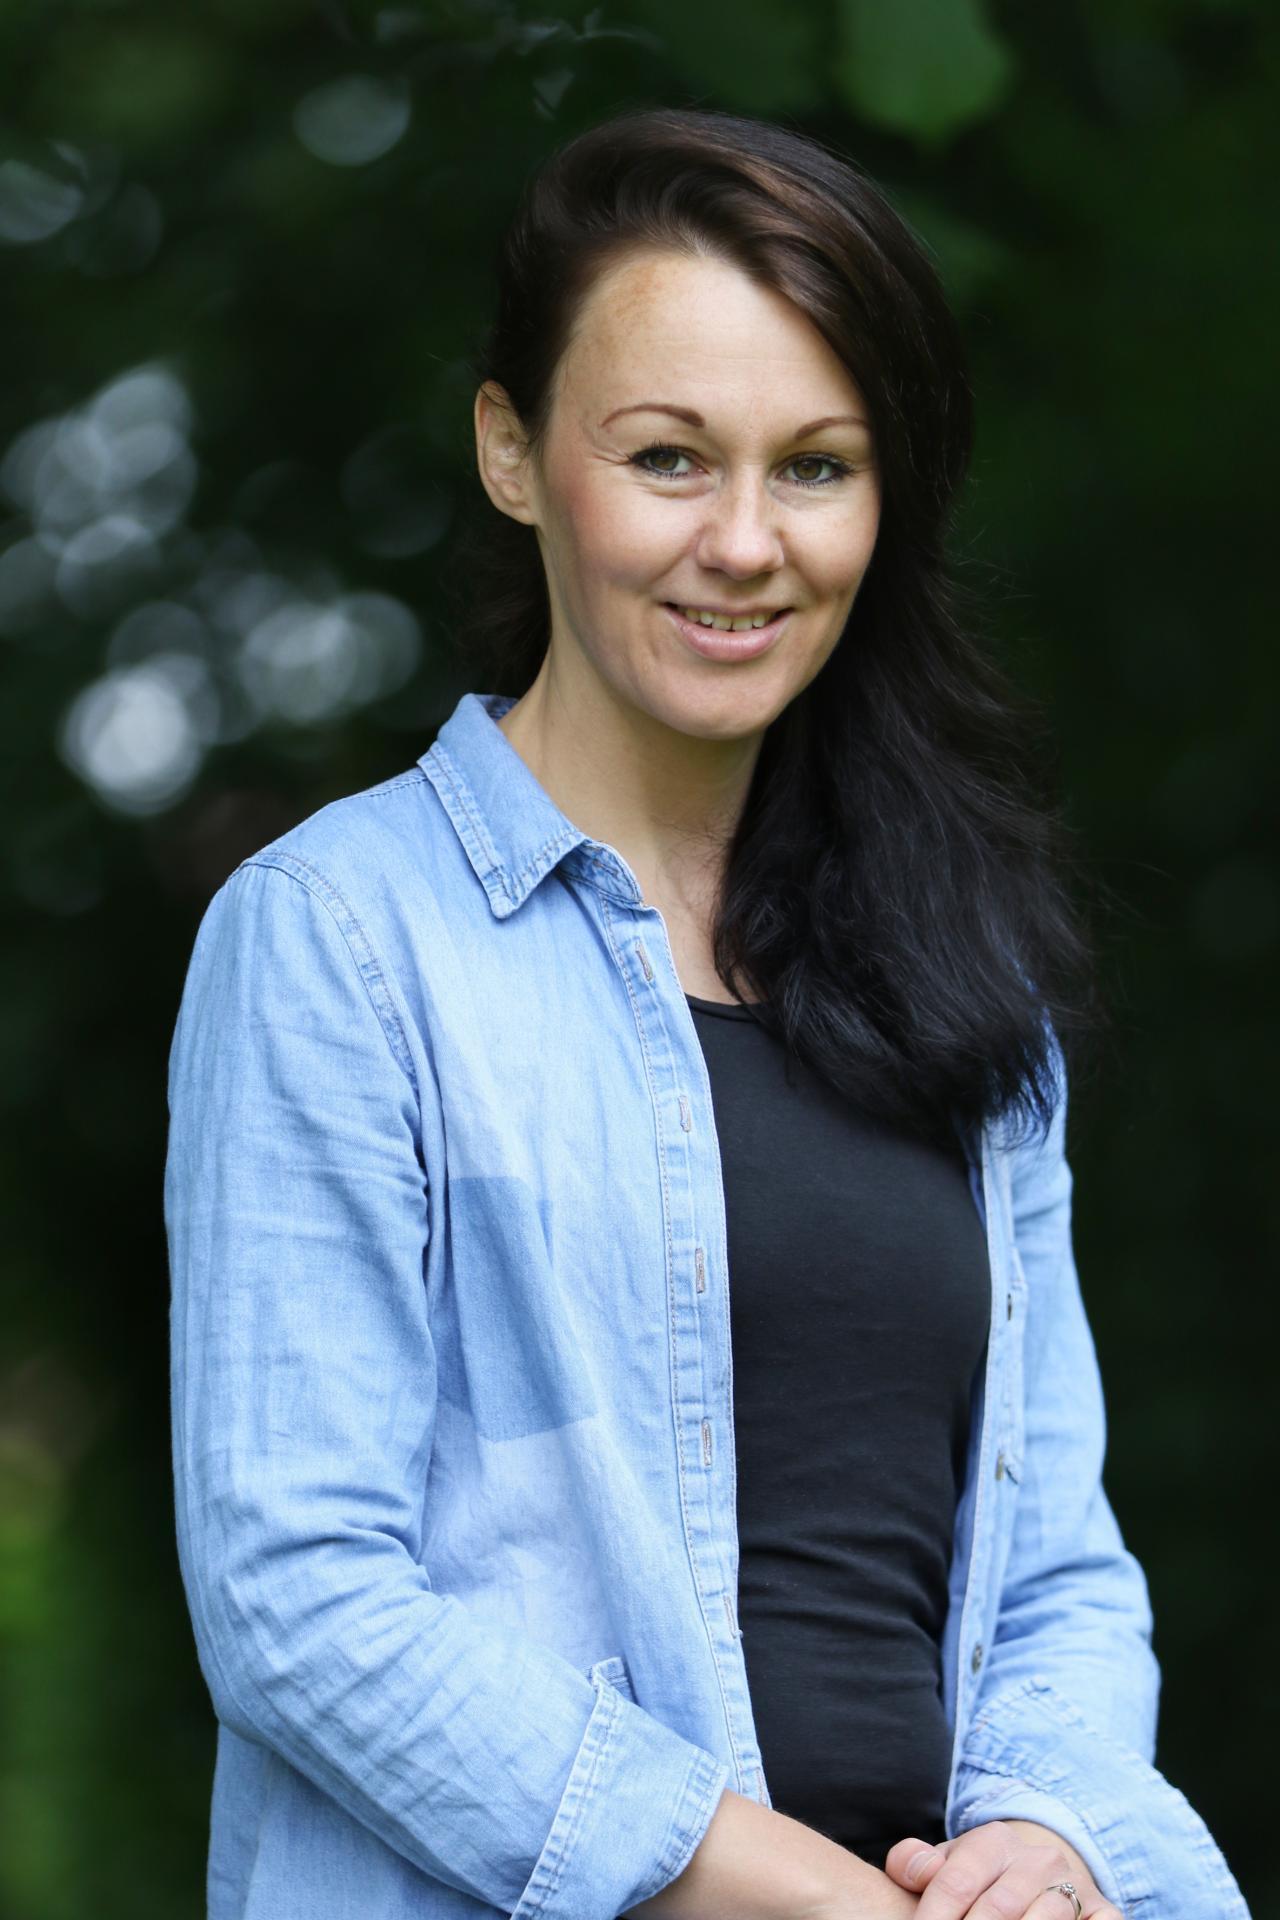 Veronika Gerdes